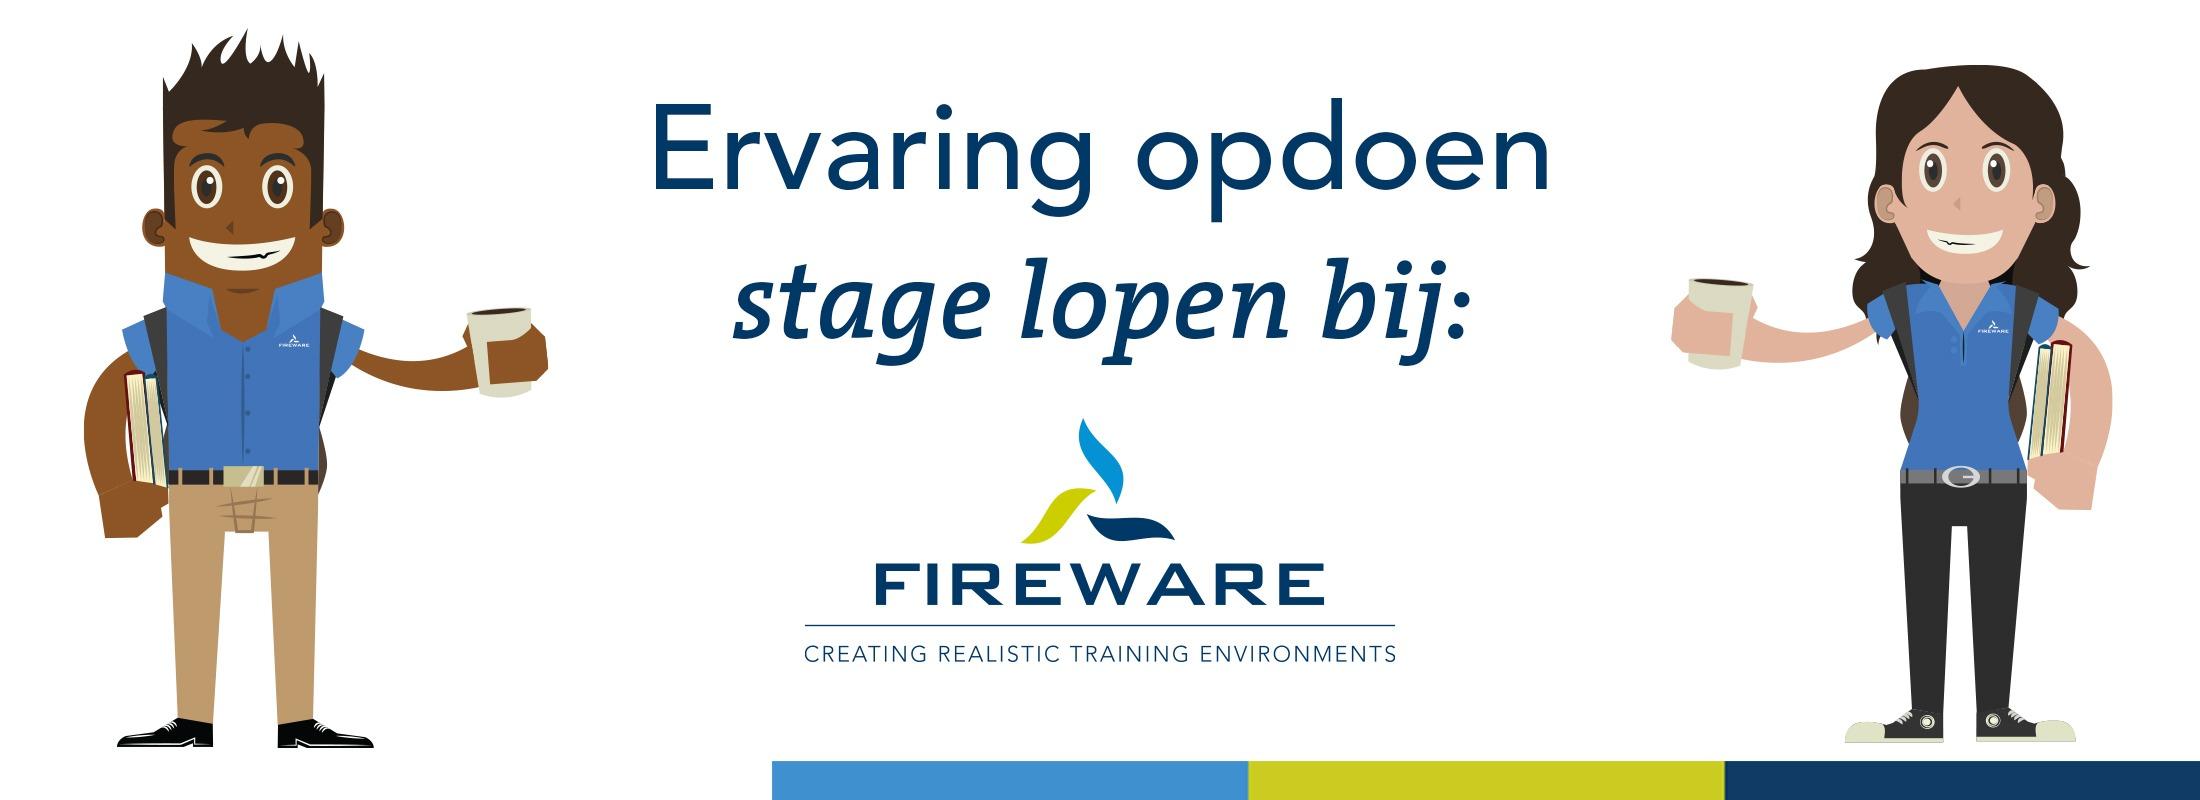 Stage lopen bij FireWare